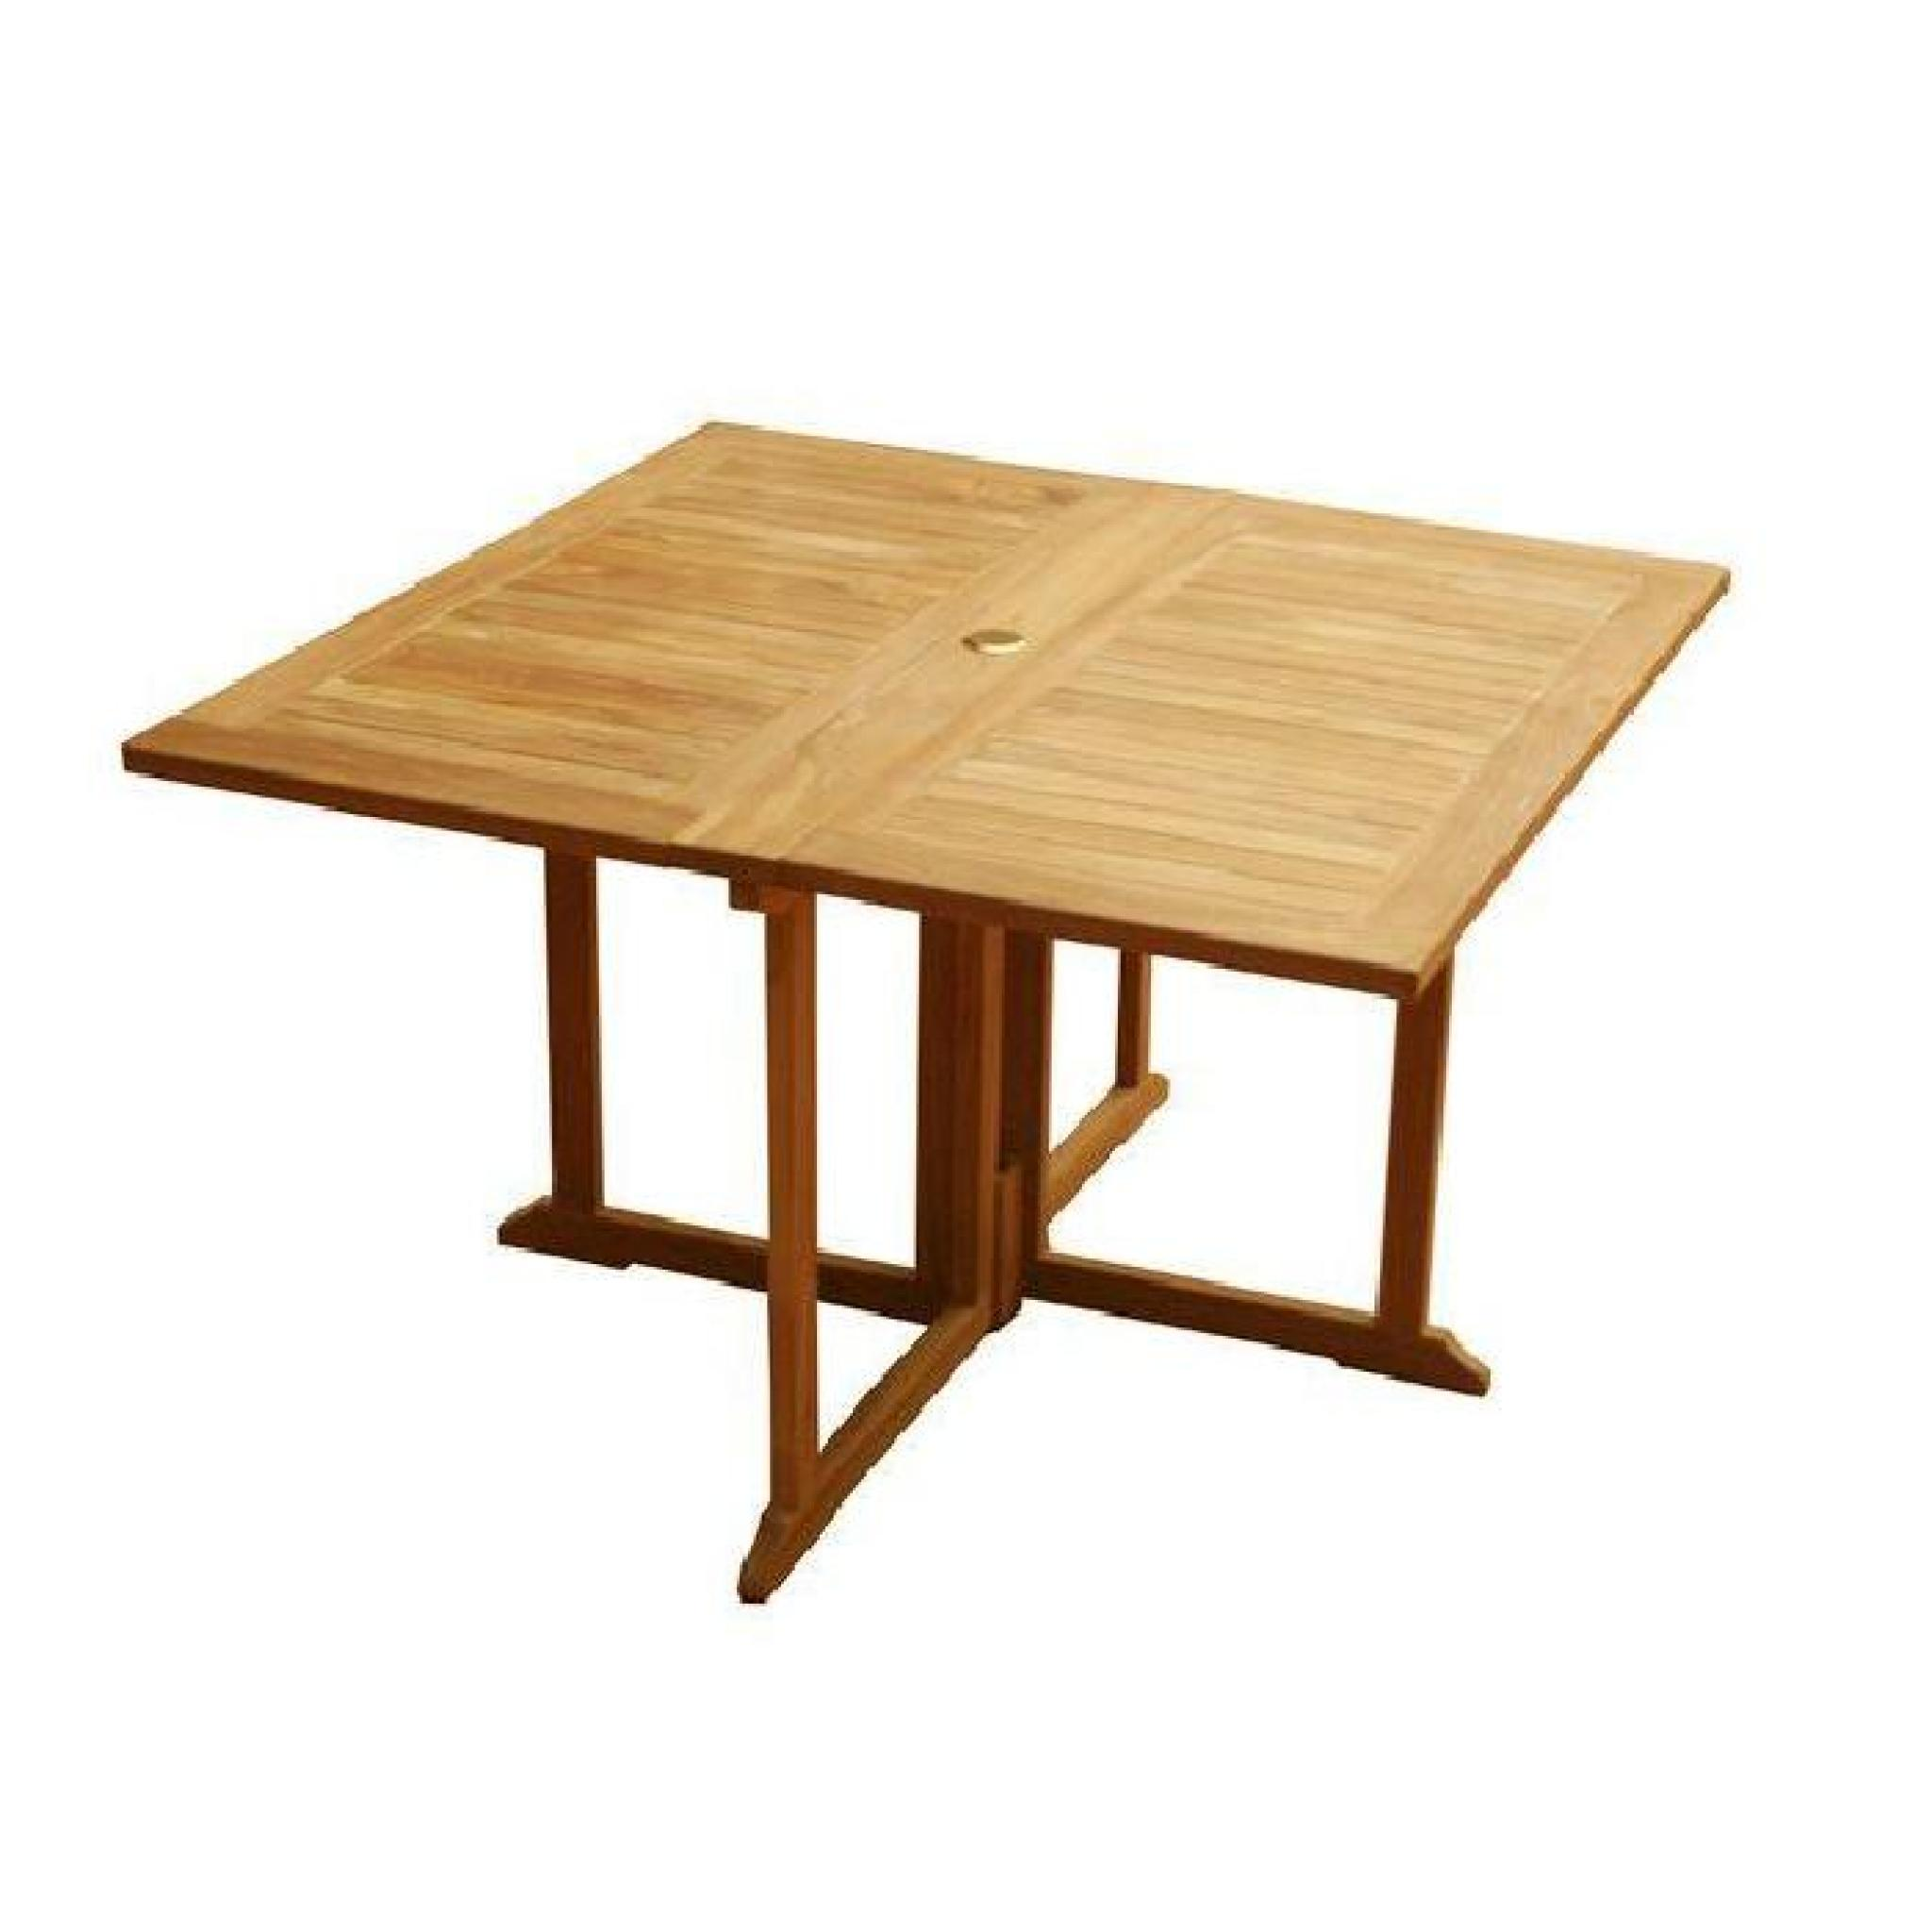 Table pliante carrée en teck Ecograde Goa 120 x 120 cm - Achat/Vente ...